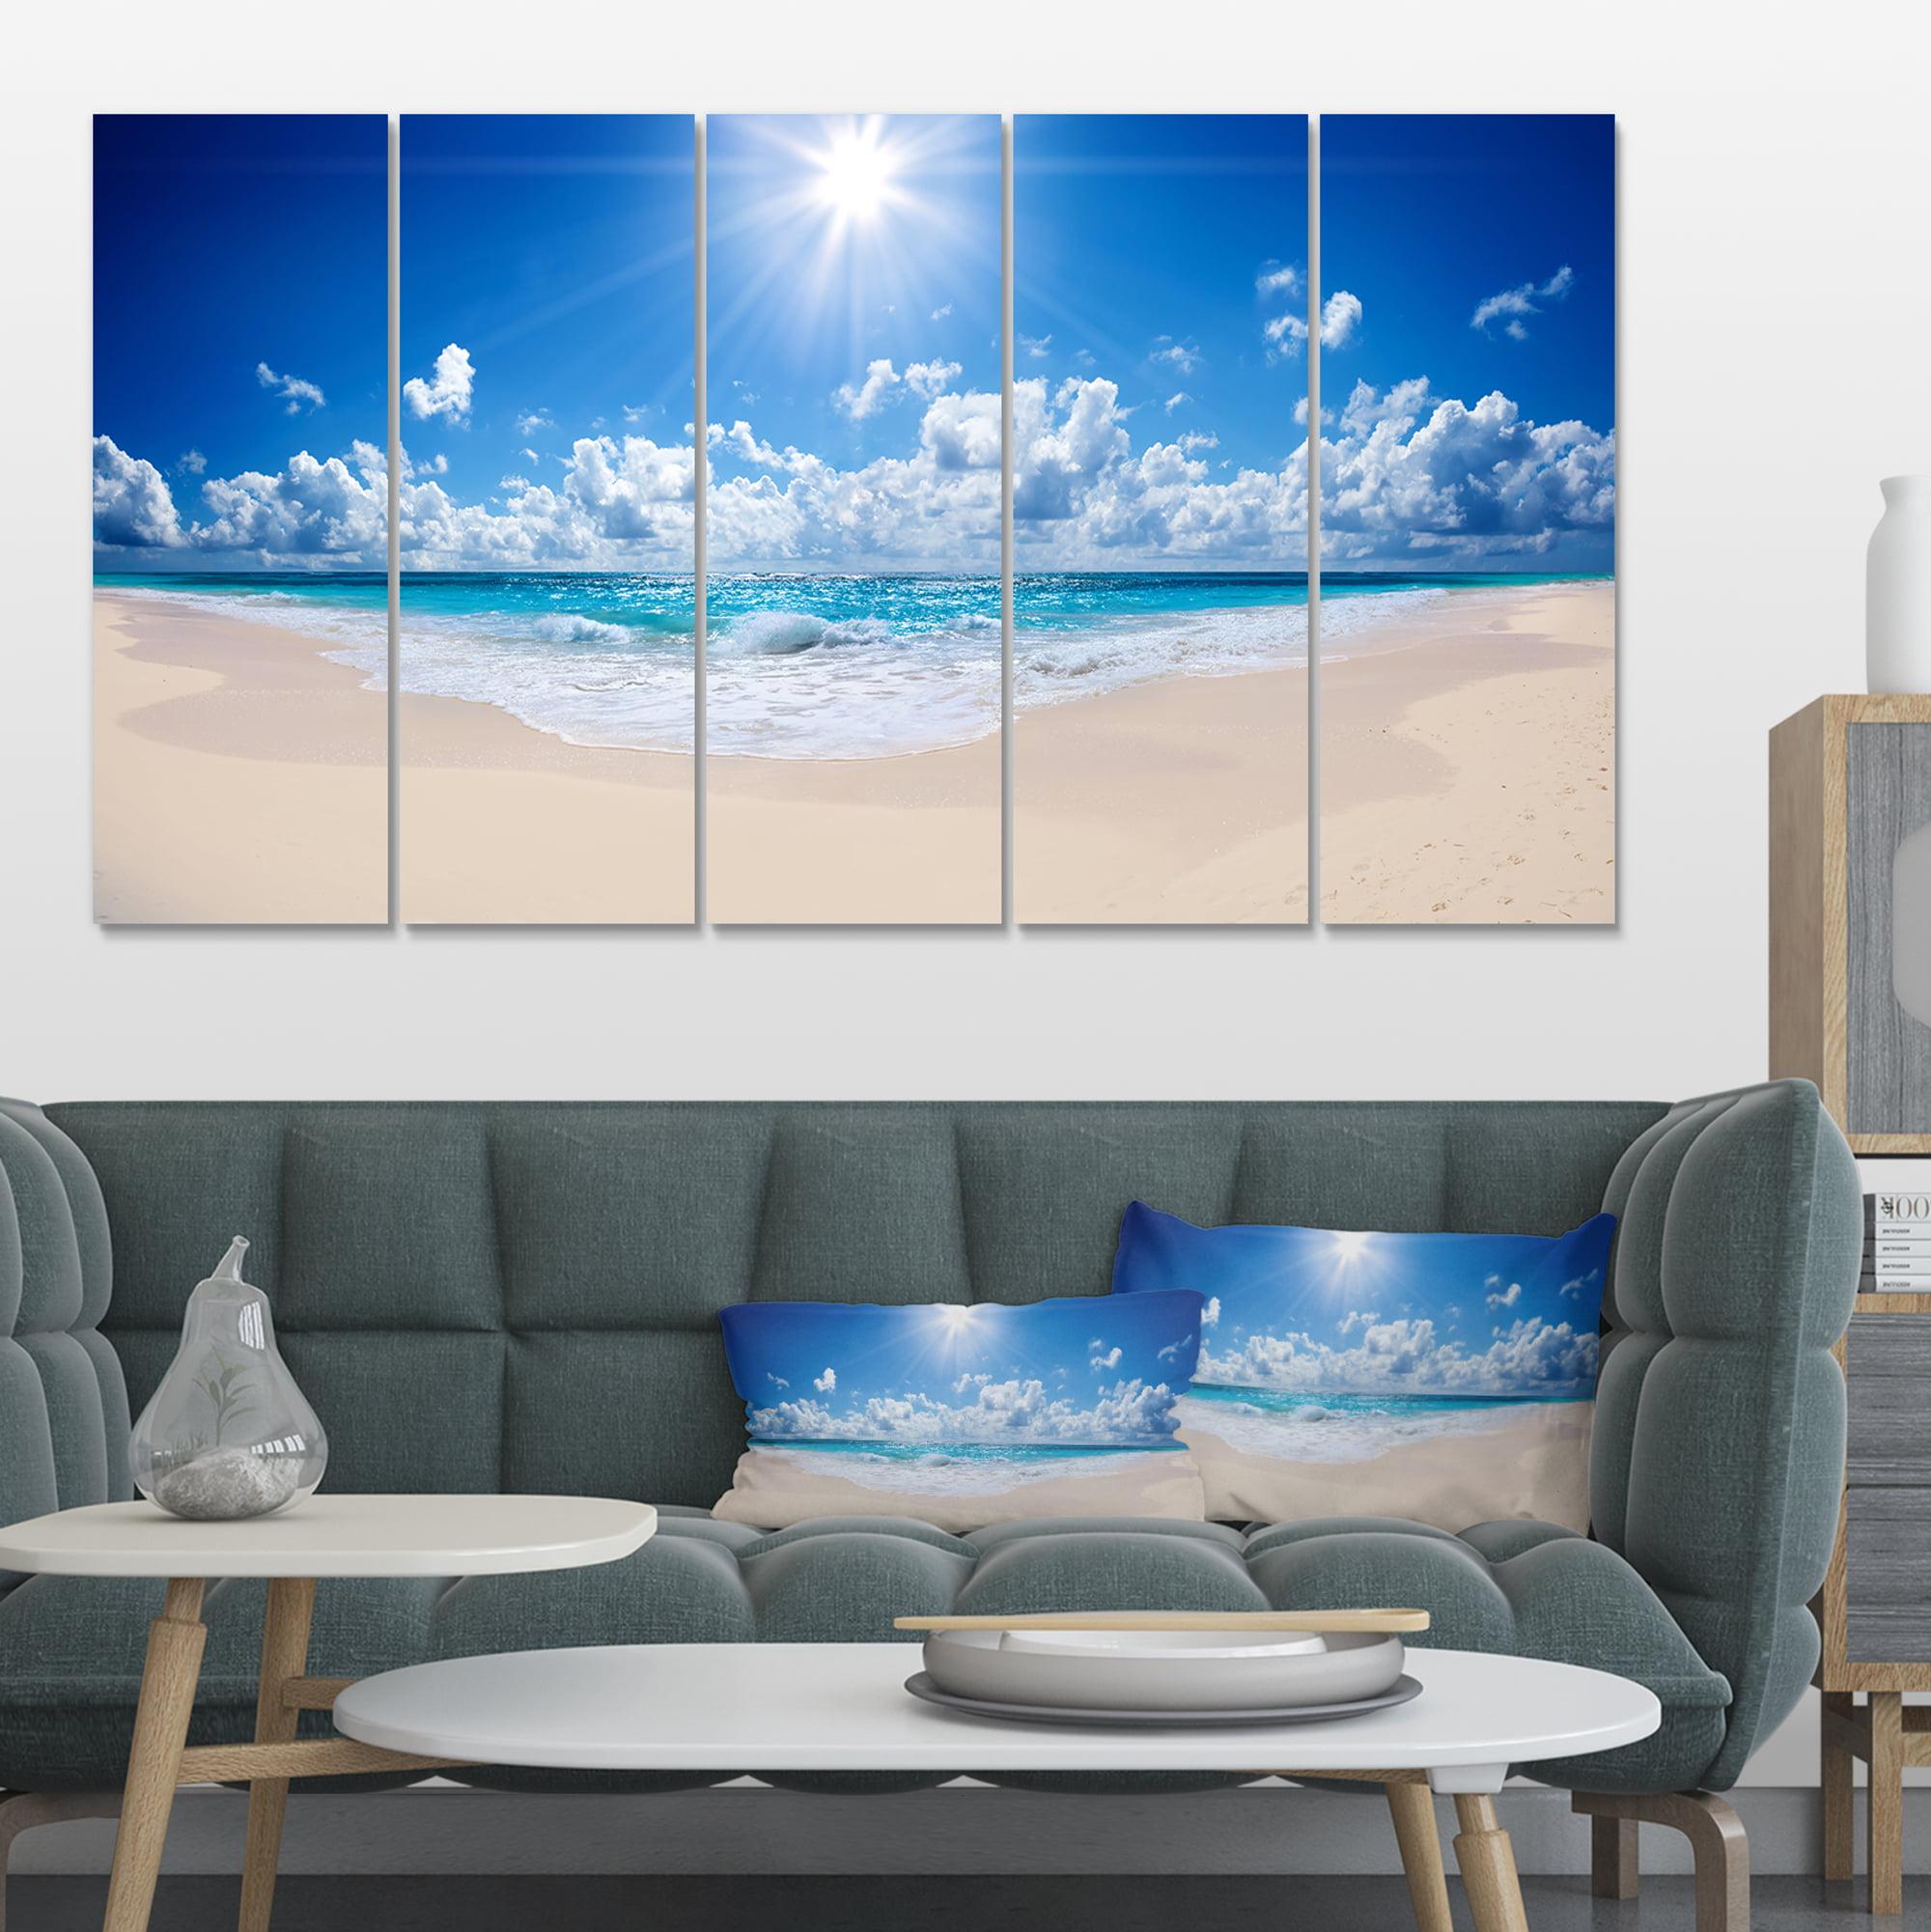 Design Art - Beautiful Tropical Beach Panorama - image 3 de 3